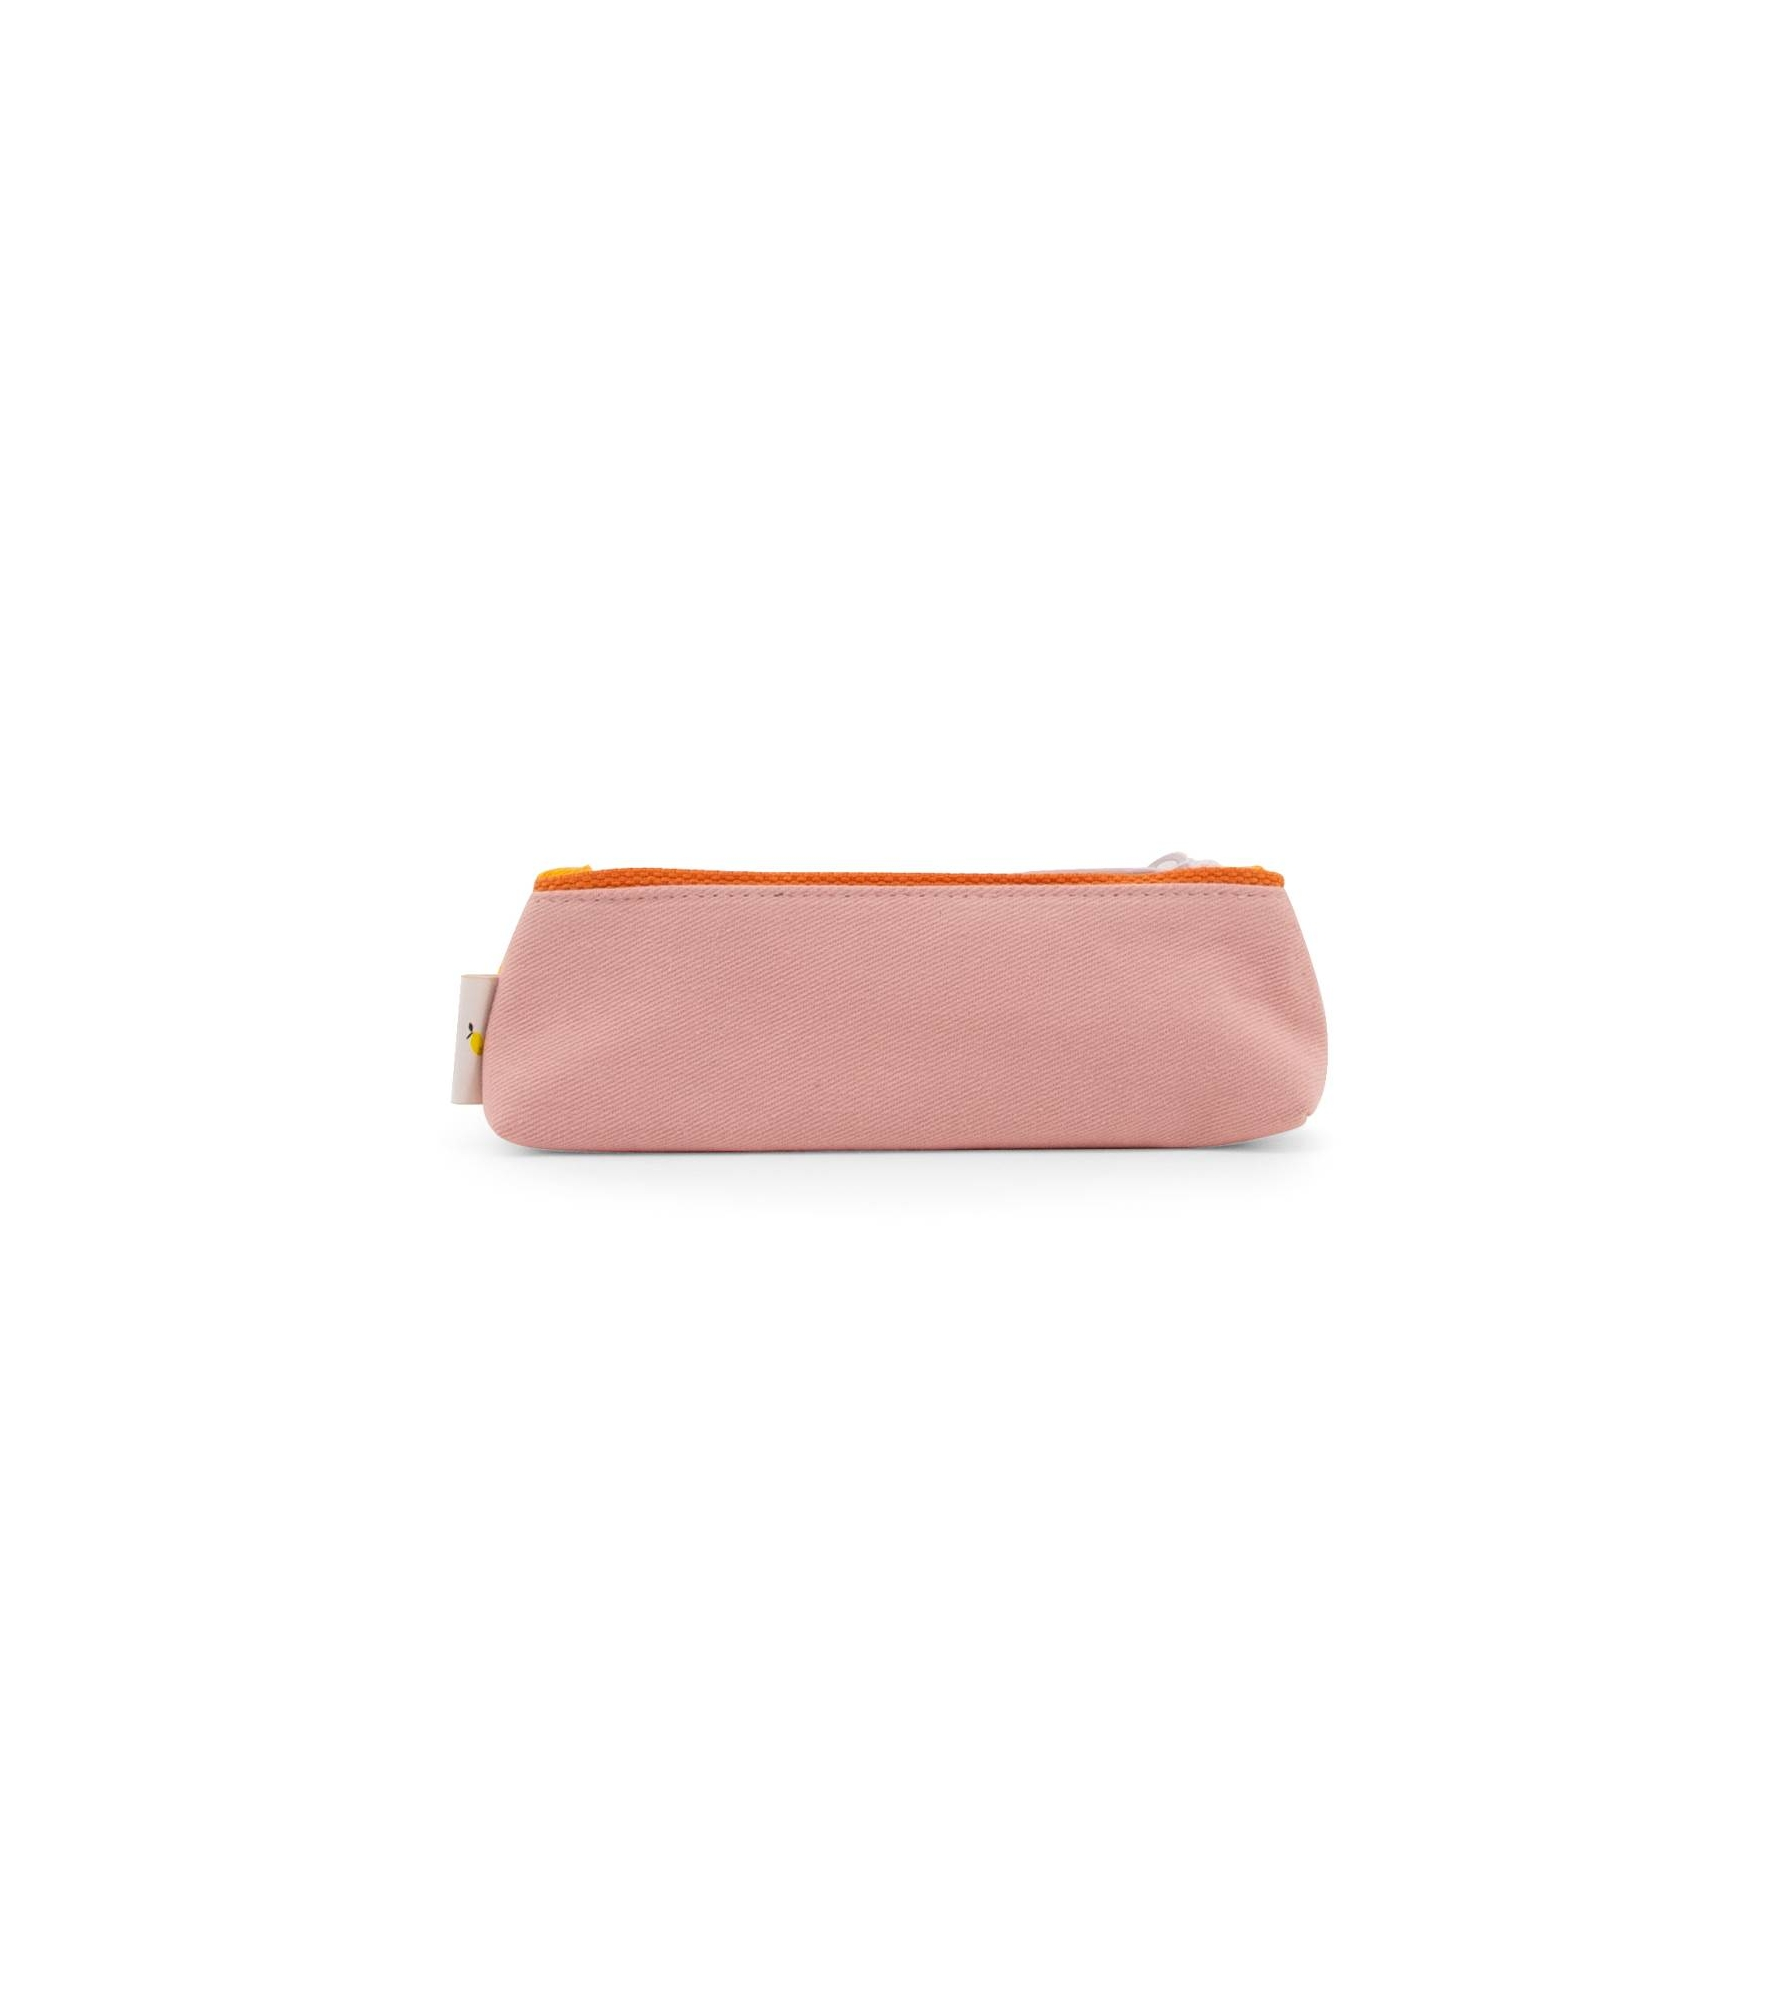 1801654_â___Sticky_Lemon_-_freckles_-_pencil_case_-_sunny_yellow_+_carrot_orange_+_candy_pink_-_ba (2)_edit.jpg